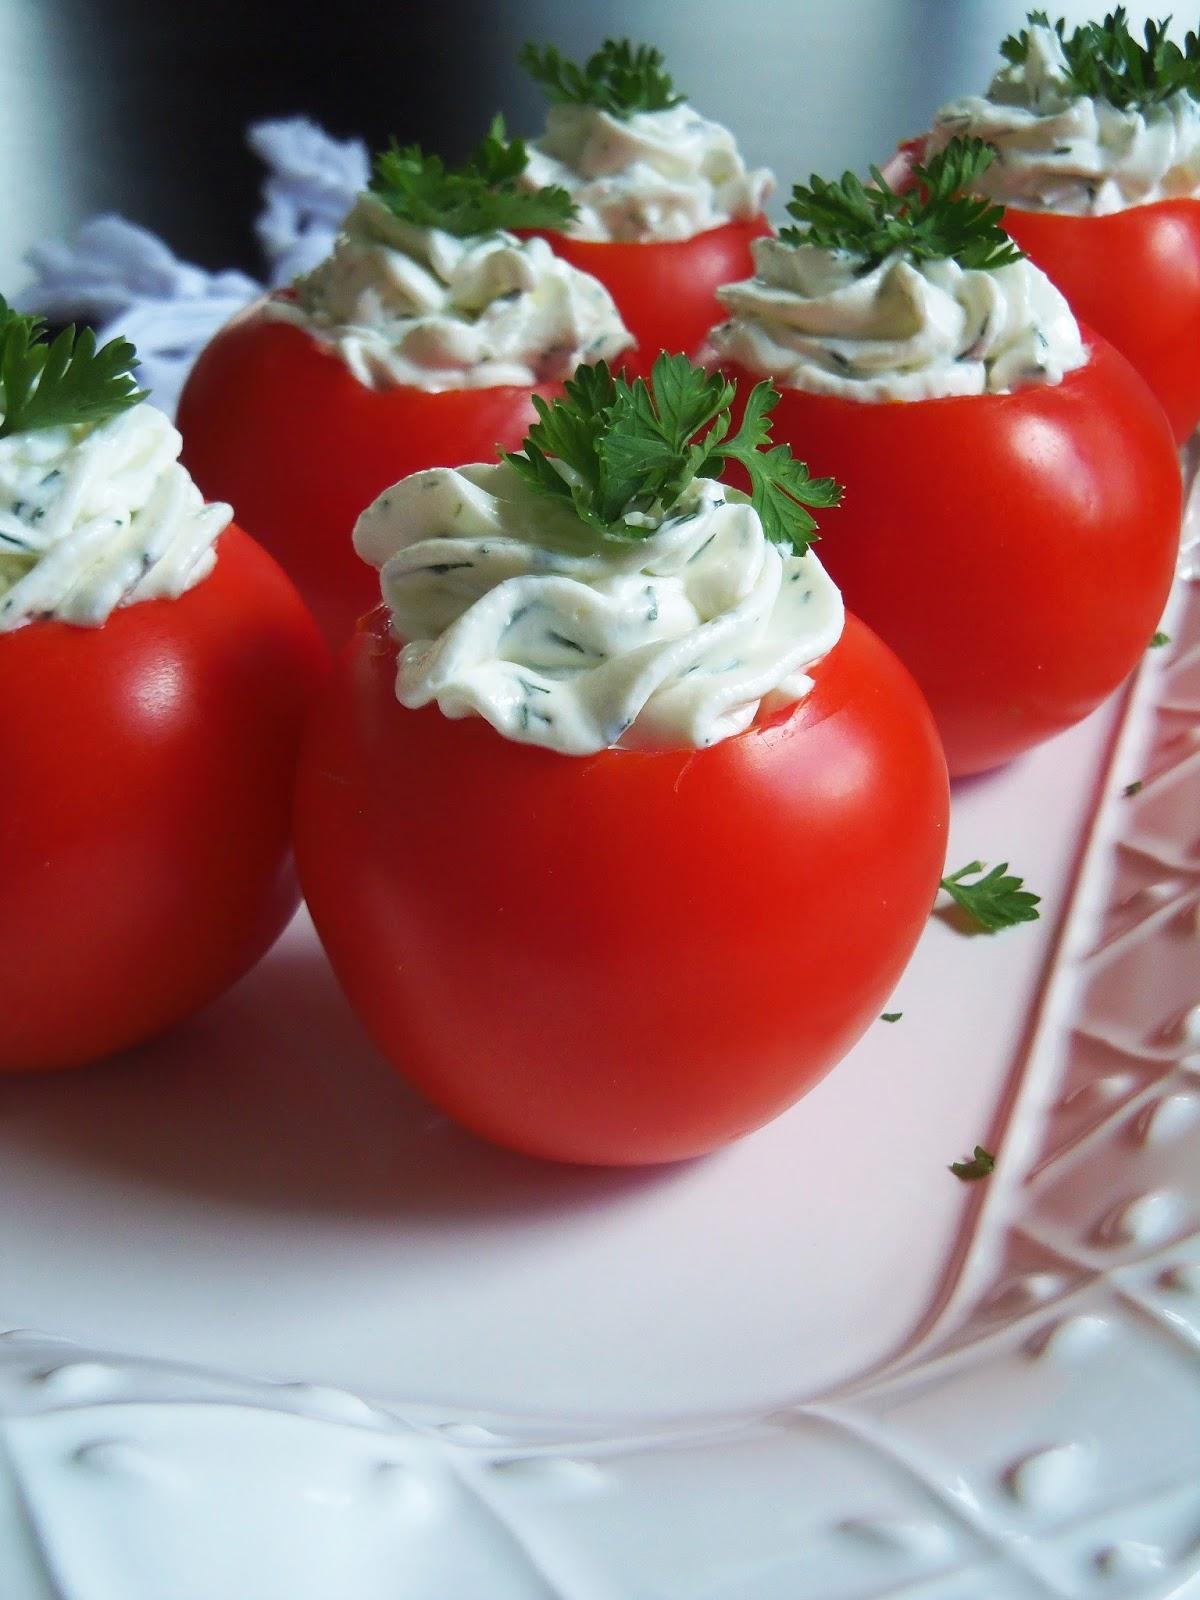 Simply Romanesco: Goat Cheese Stuffed Tomatoes